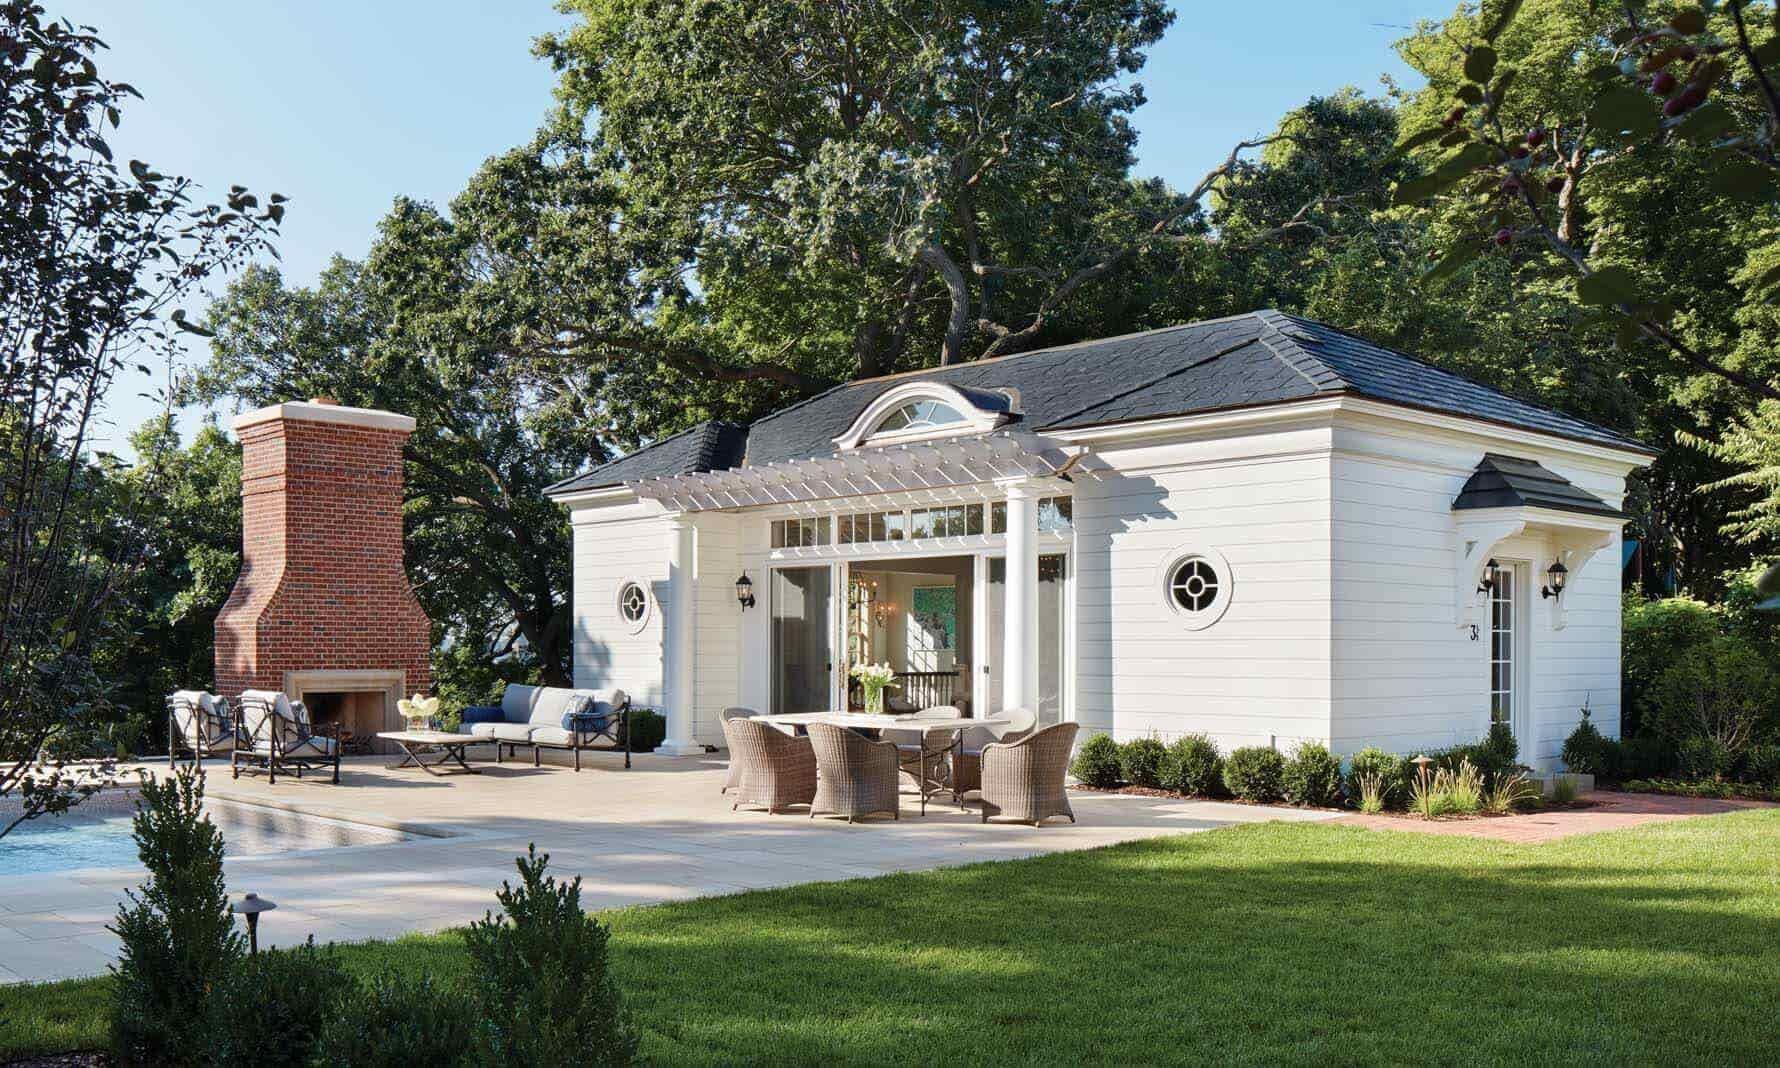 Pool House Design Ideas